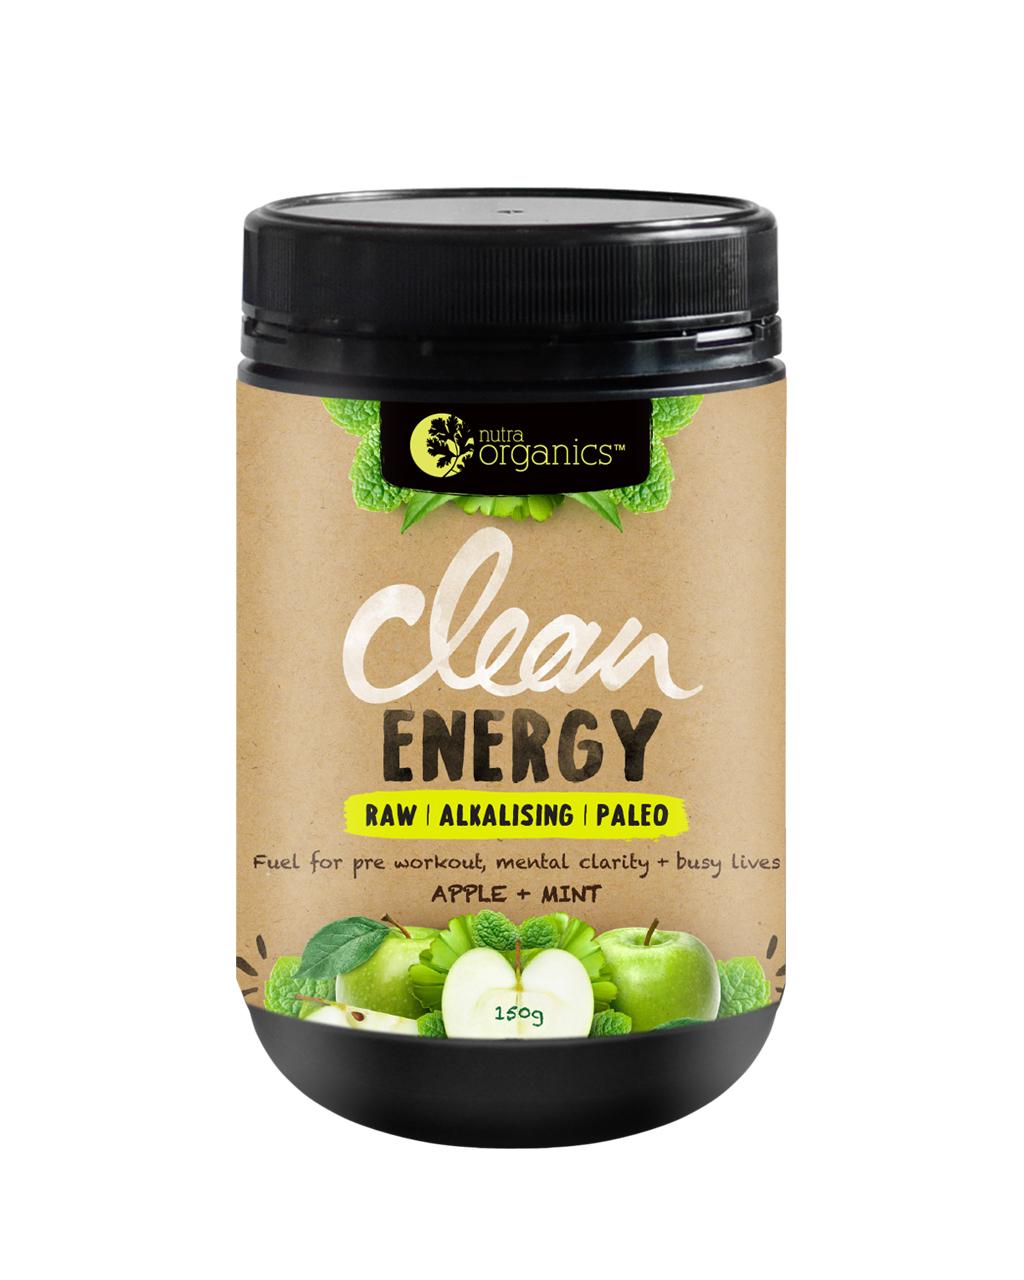 Clean-Energy-Apple-Mint.jpg